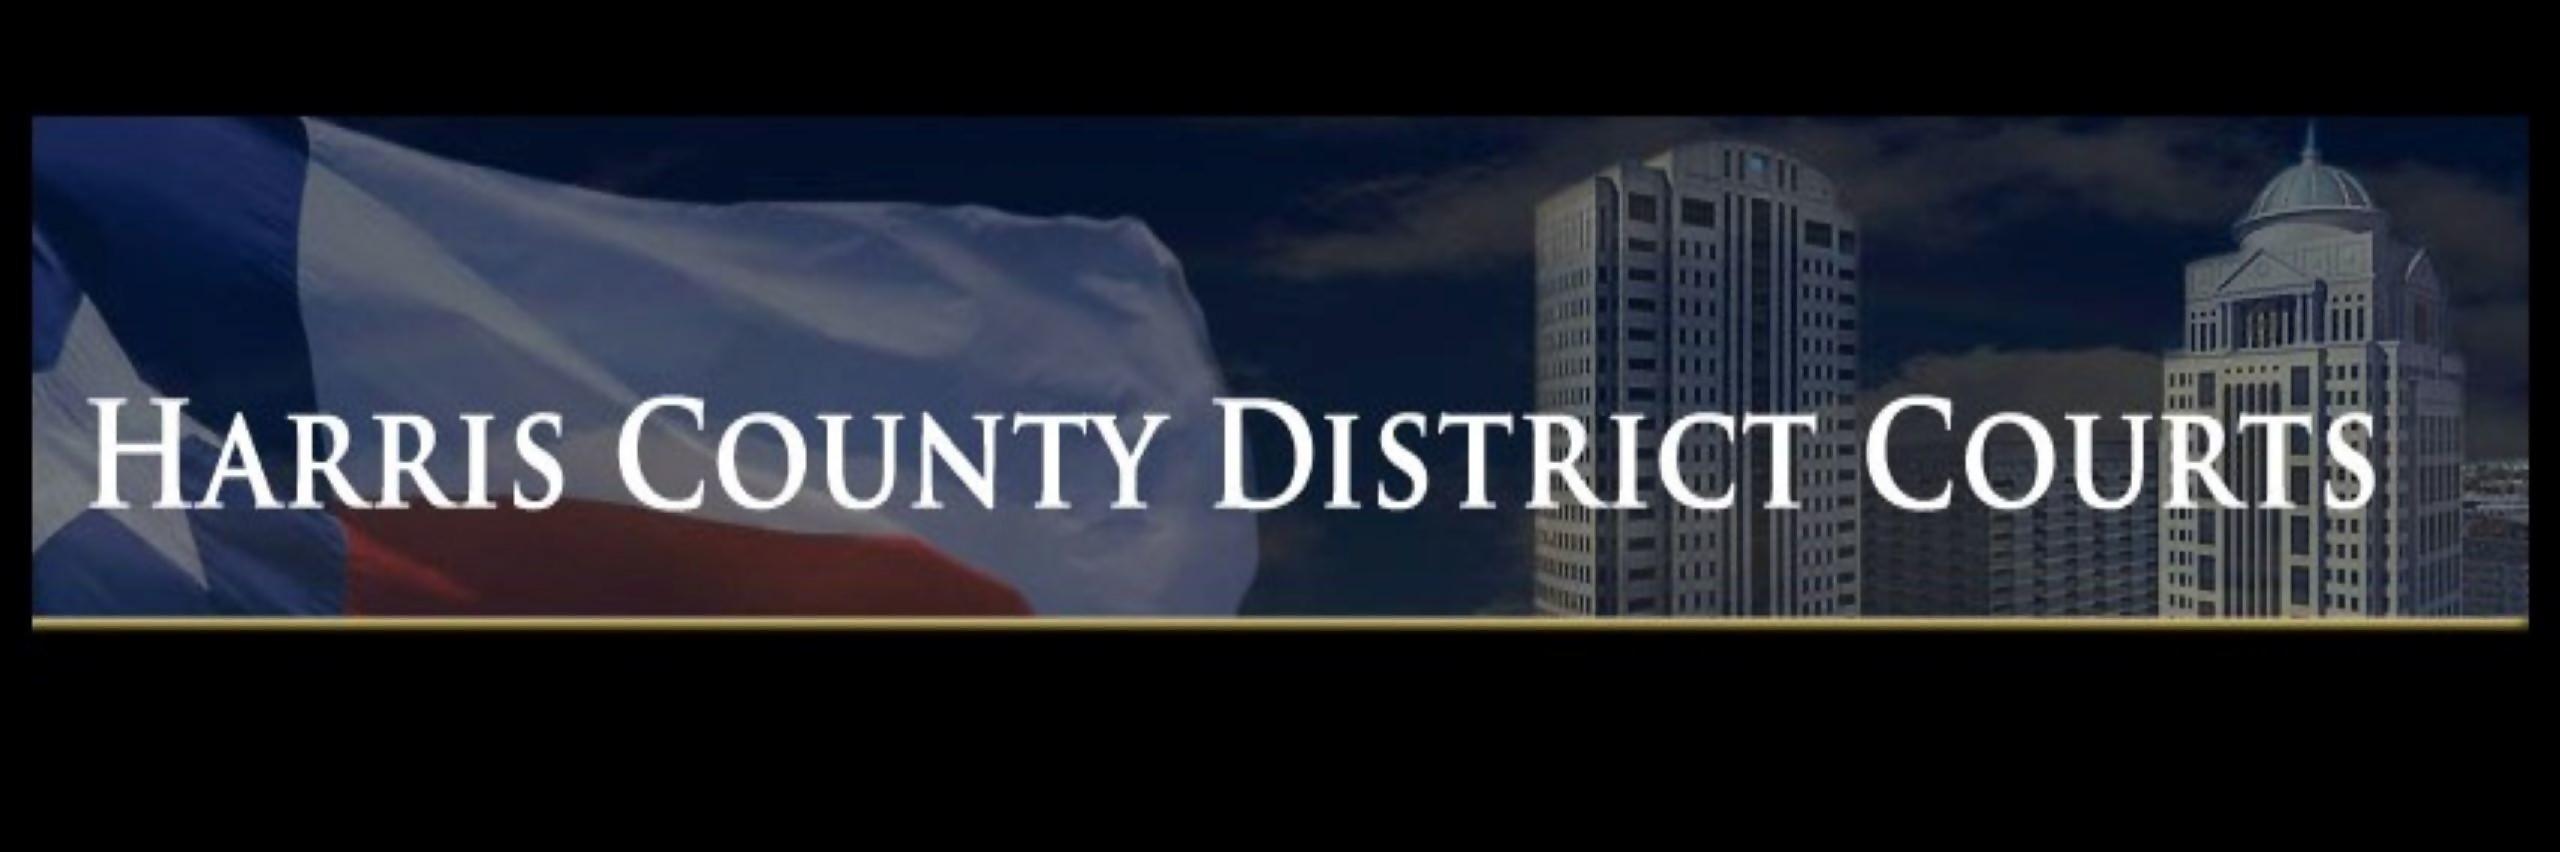 339th District Court - Live Stream